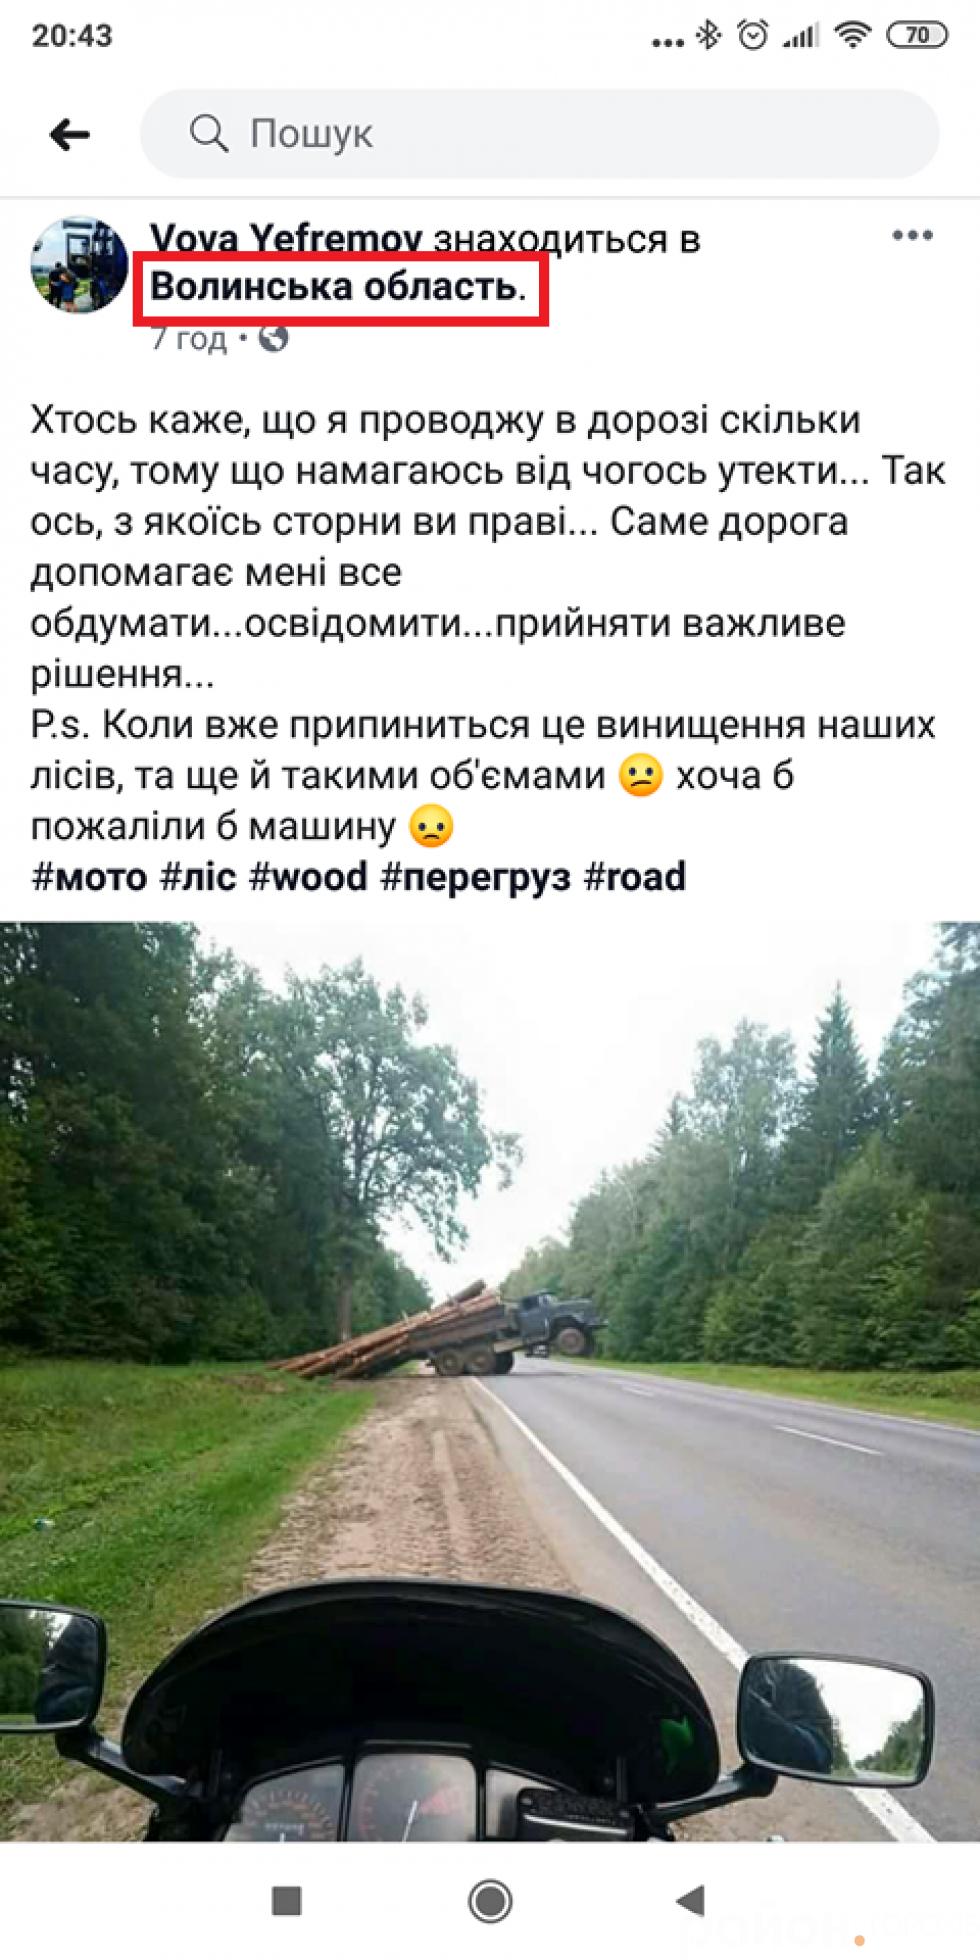 Допис Володимира Єфремова